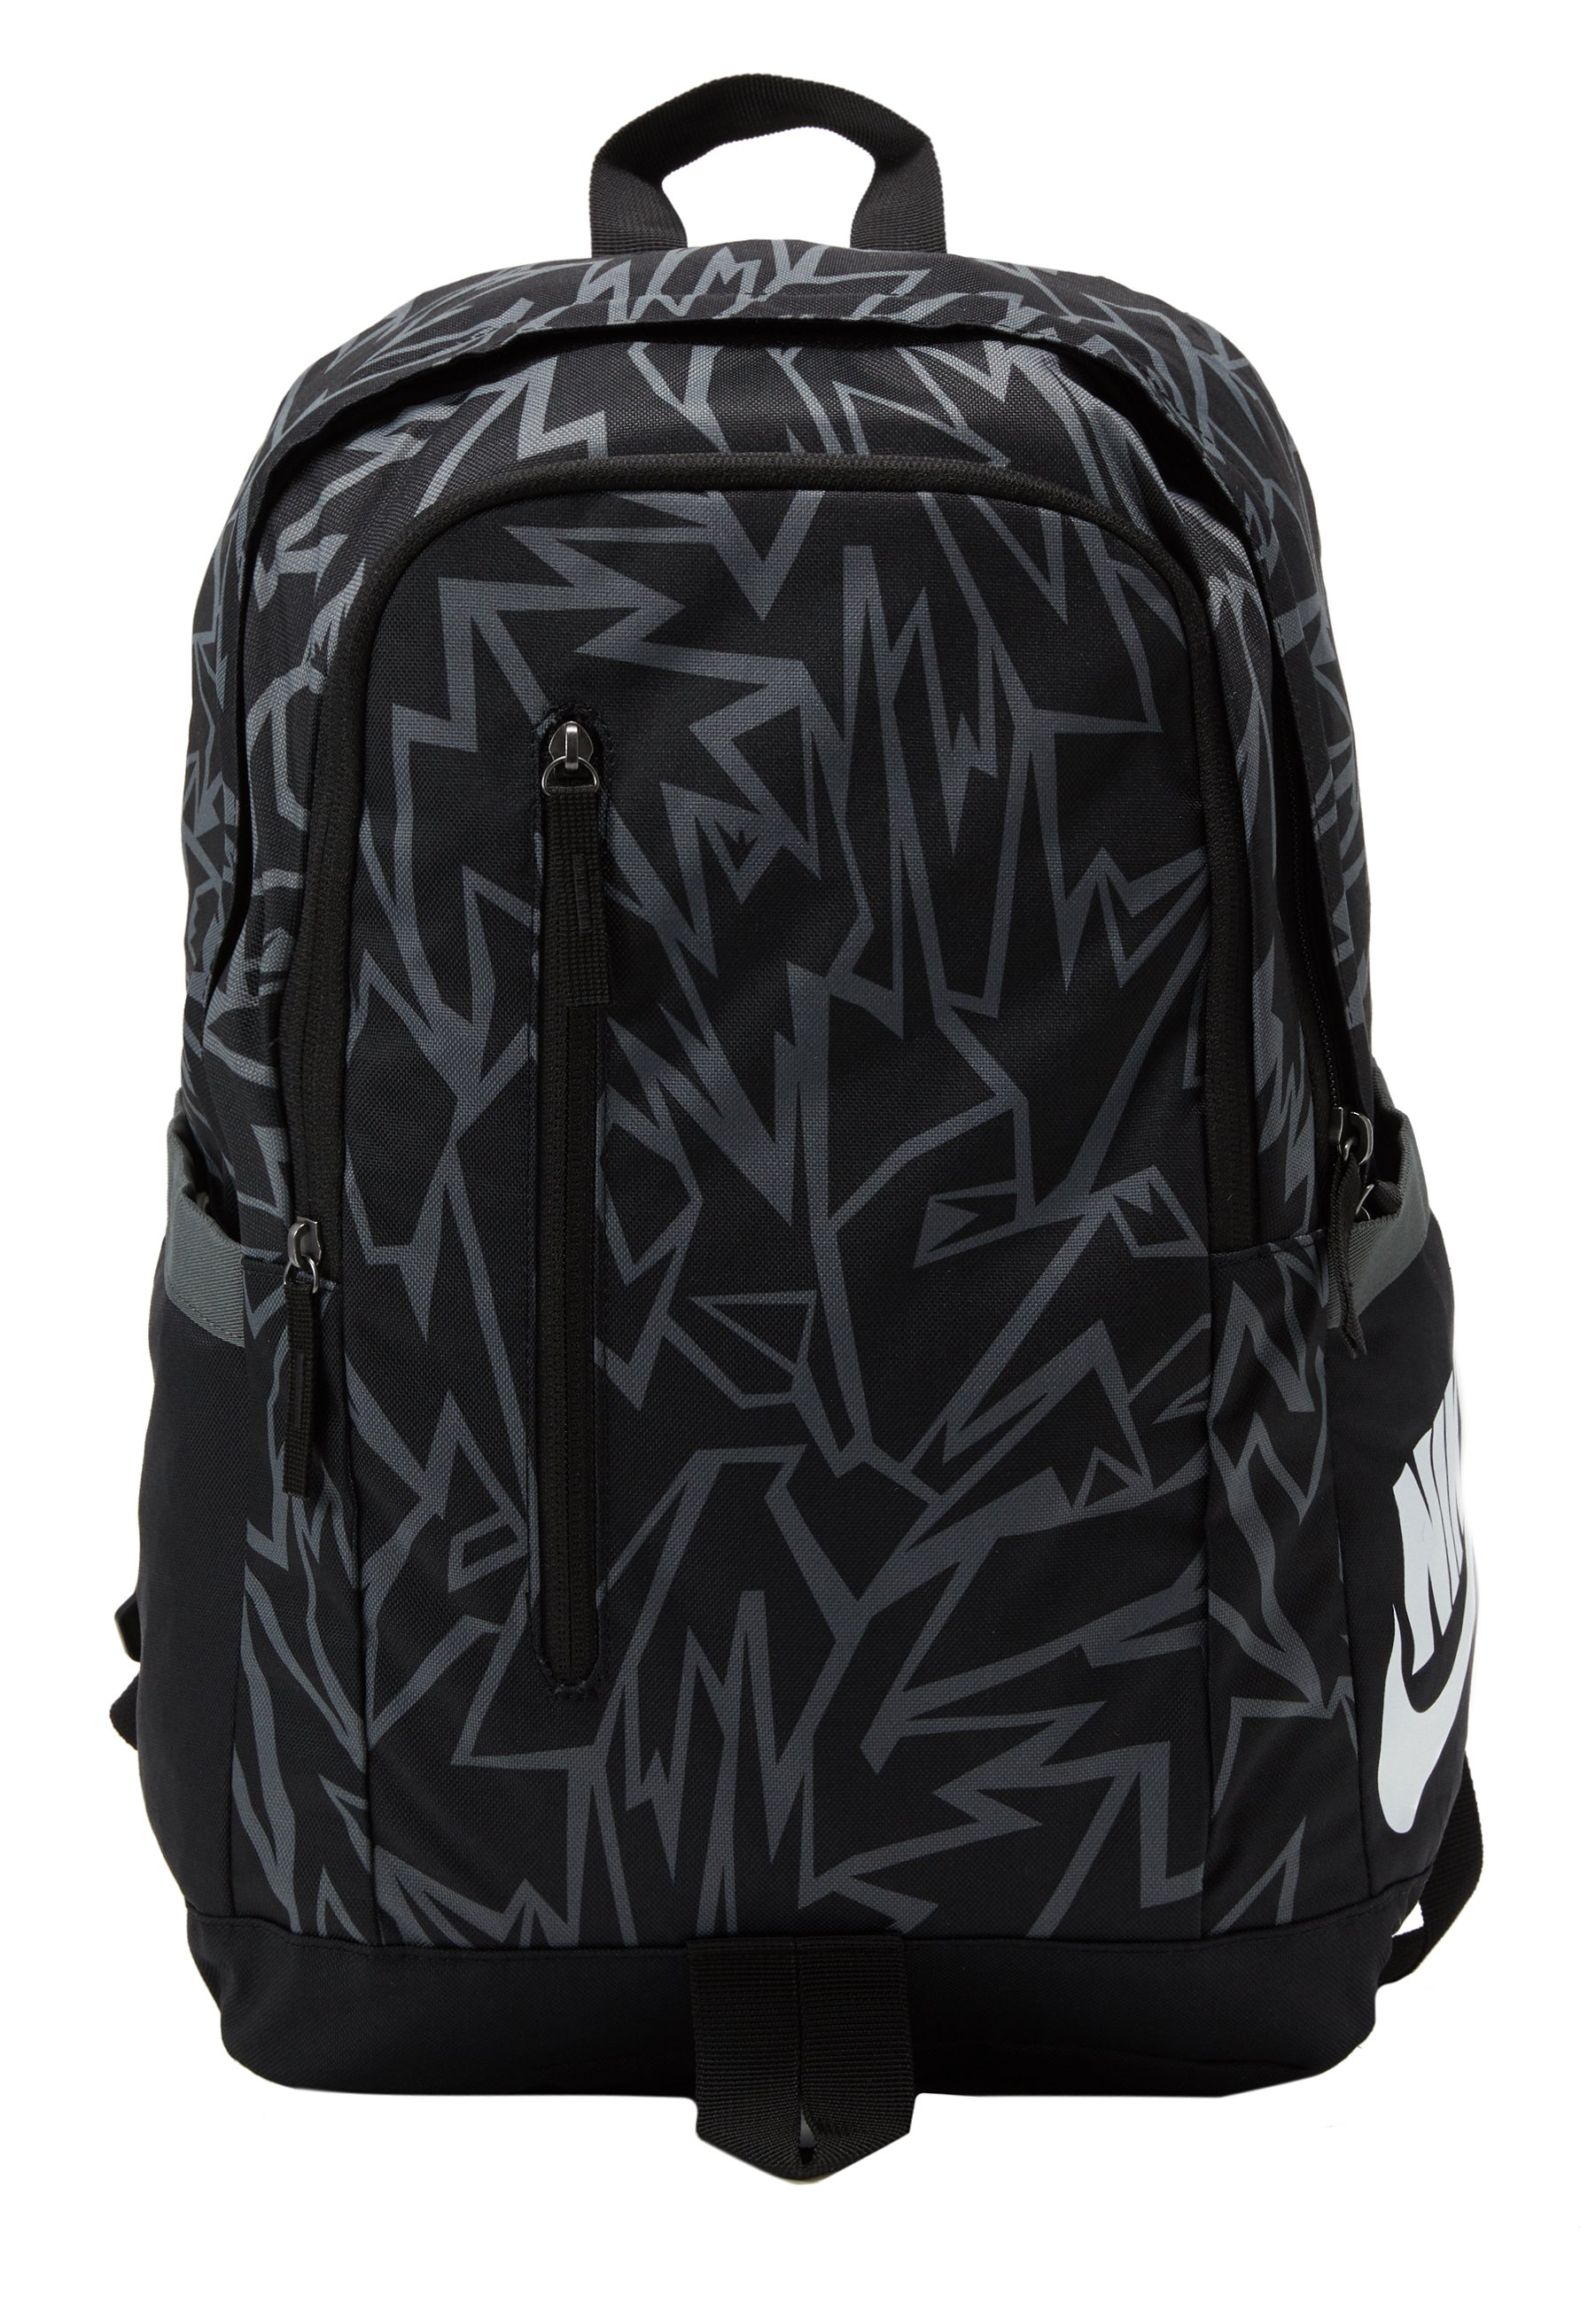 Nike Sportswear ALL ACCESS SOLEDAY - Ryggsekk - black/iron grey/white/svart BsN0RzZA4JSlBjv